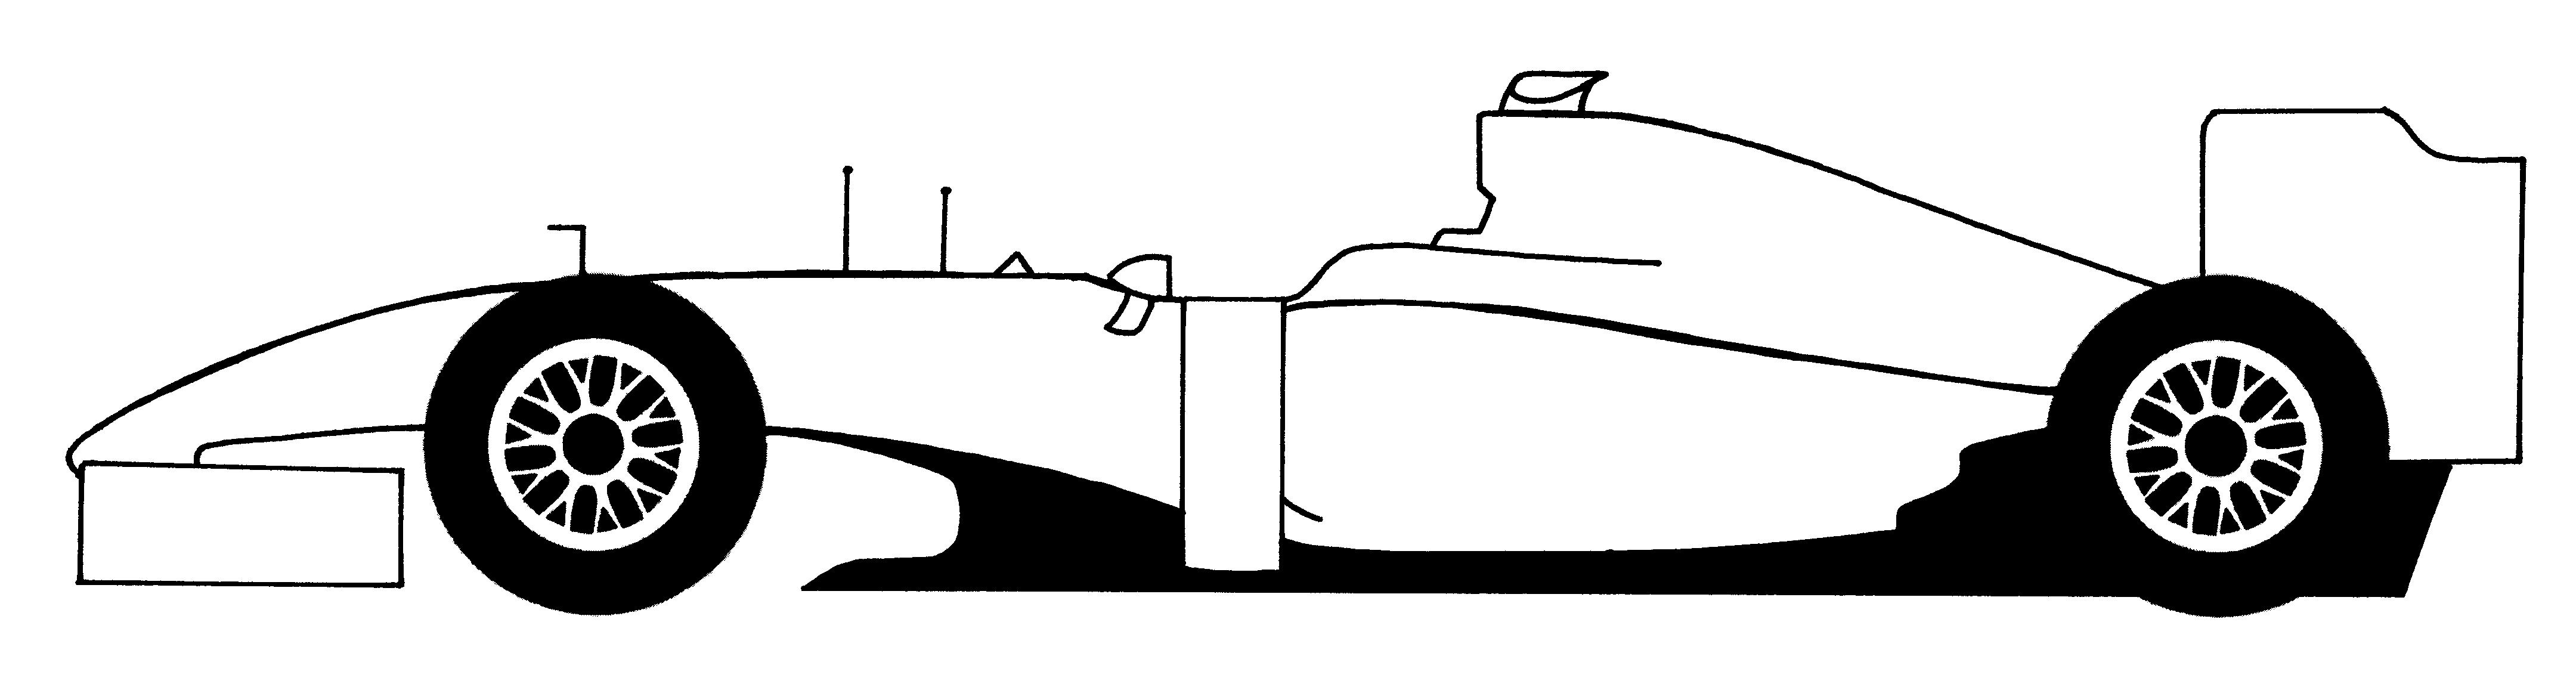 Abcya Car Racing